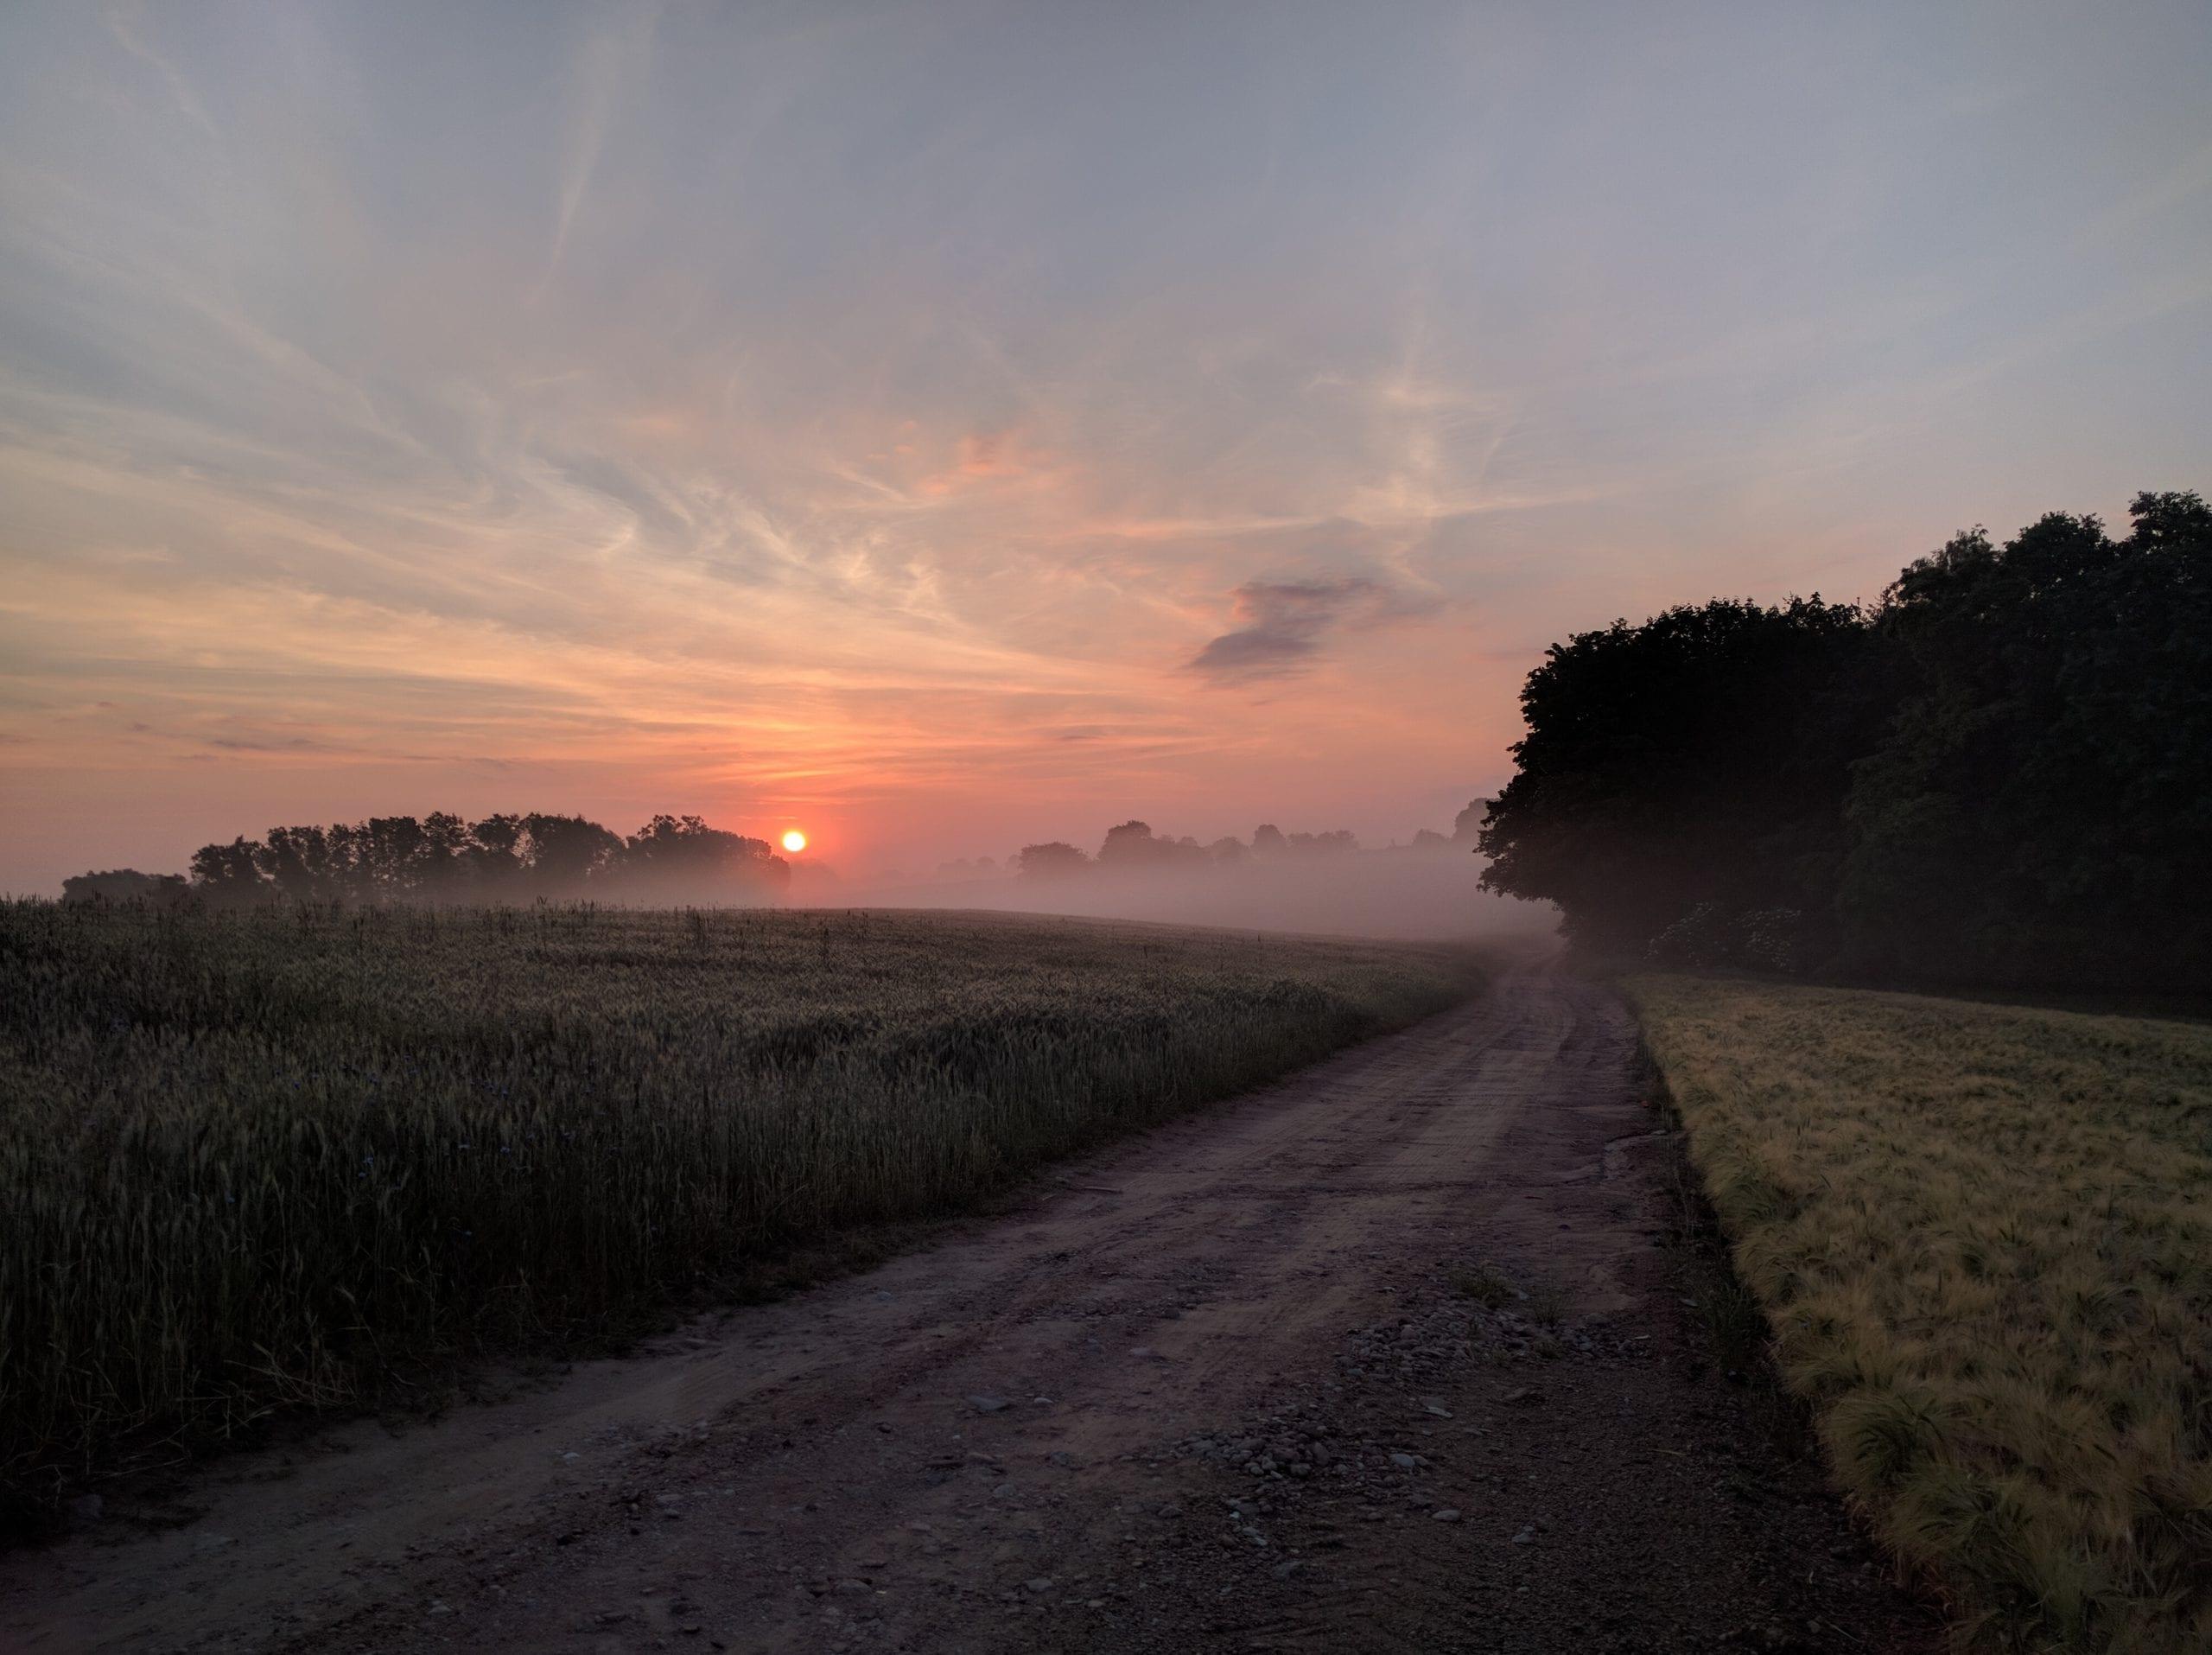 Gravel road in Poland at dusk